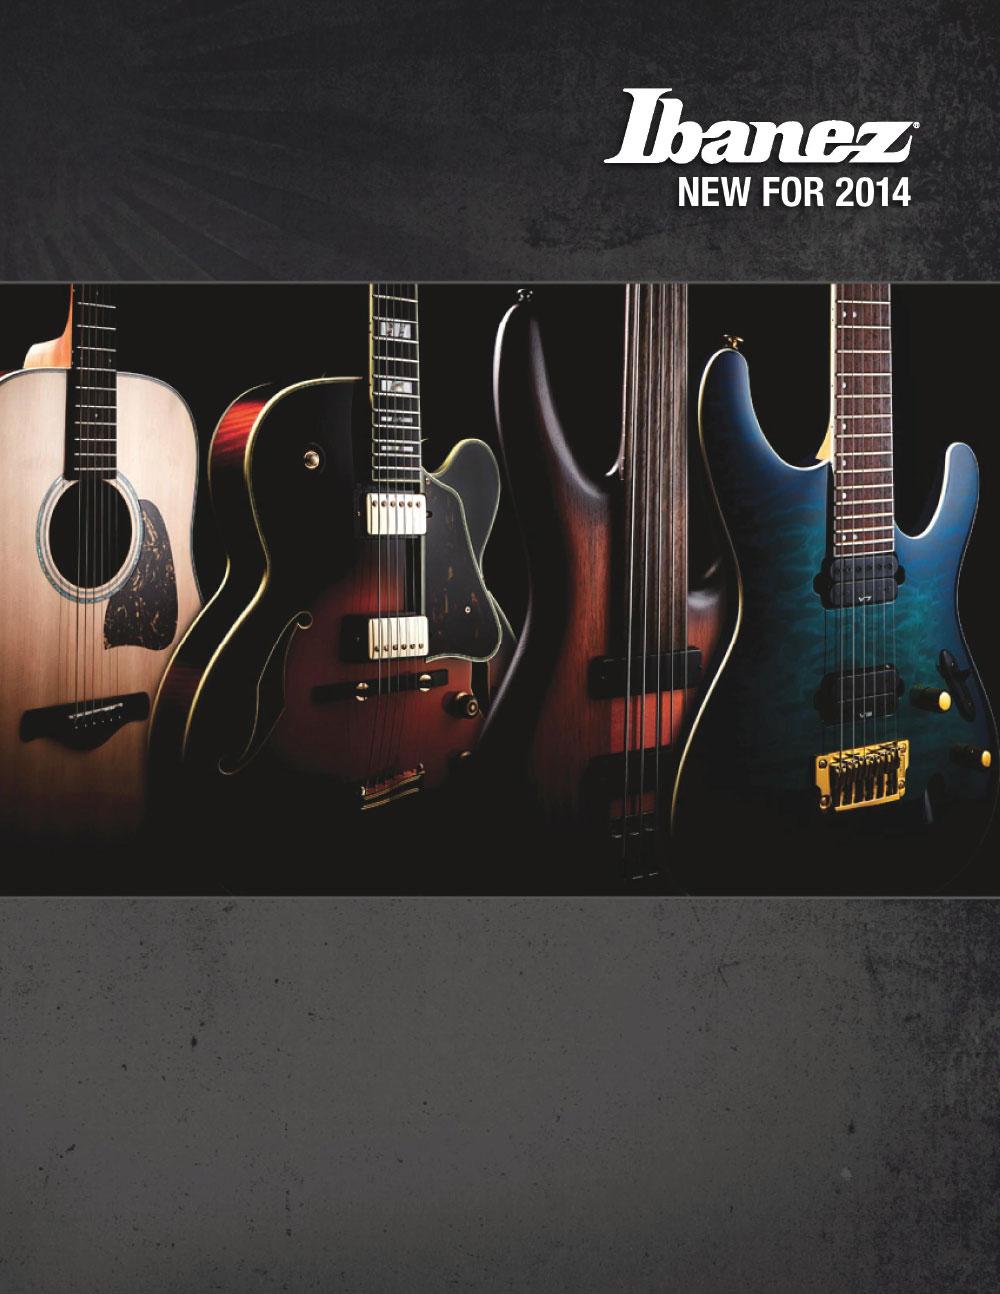 Ibanez Catalog News 2014 Winter